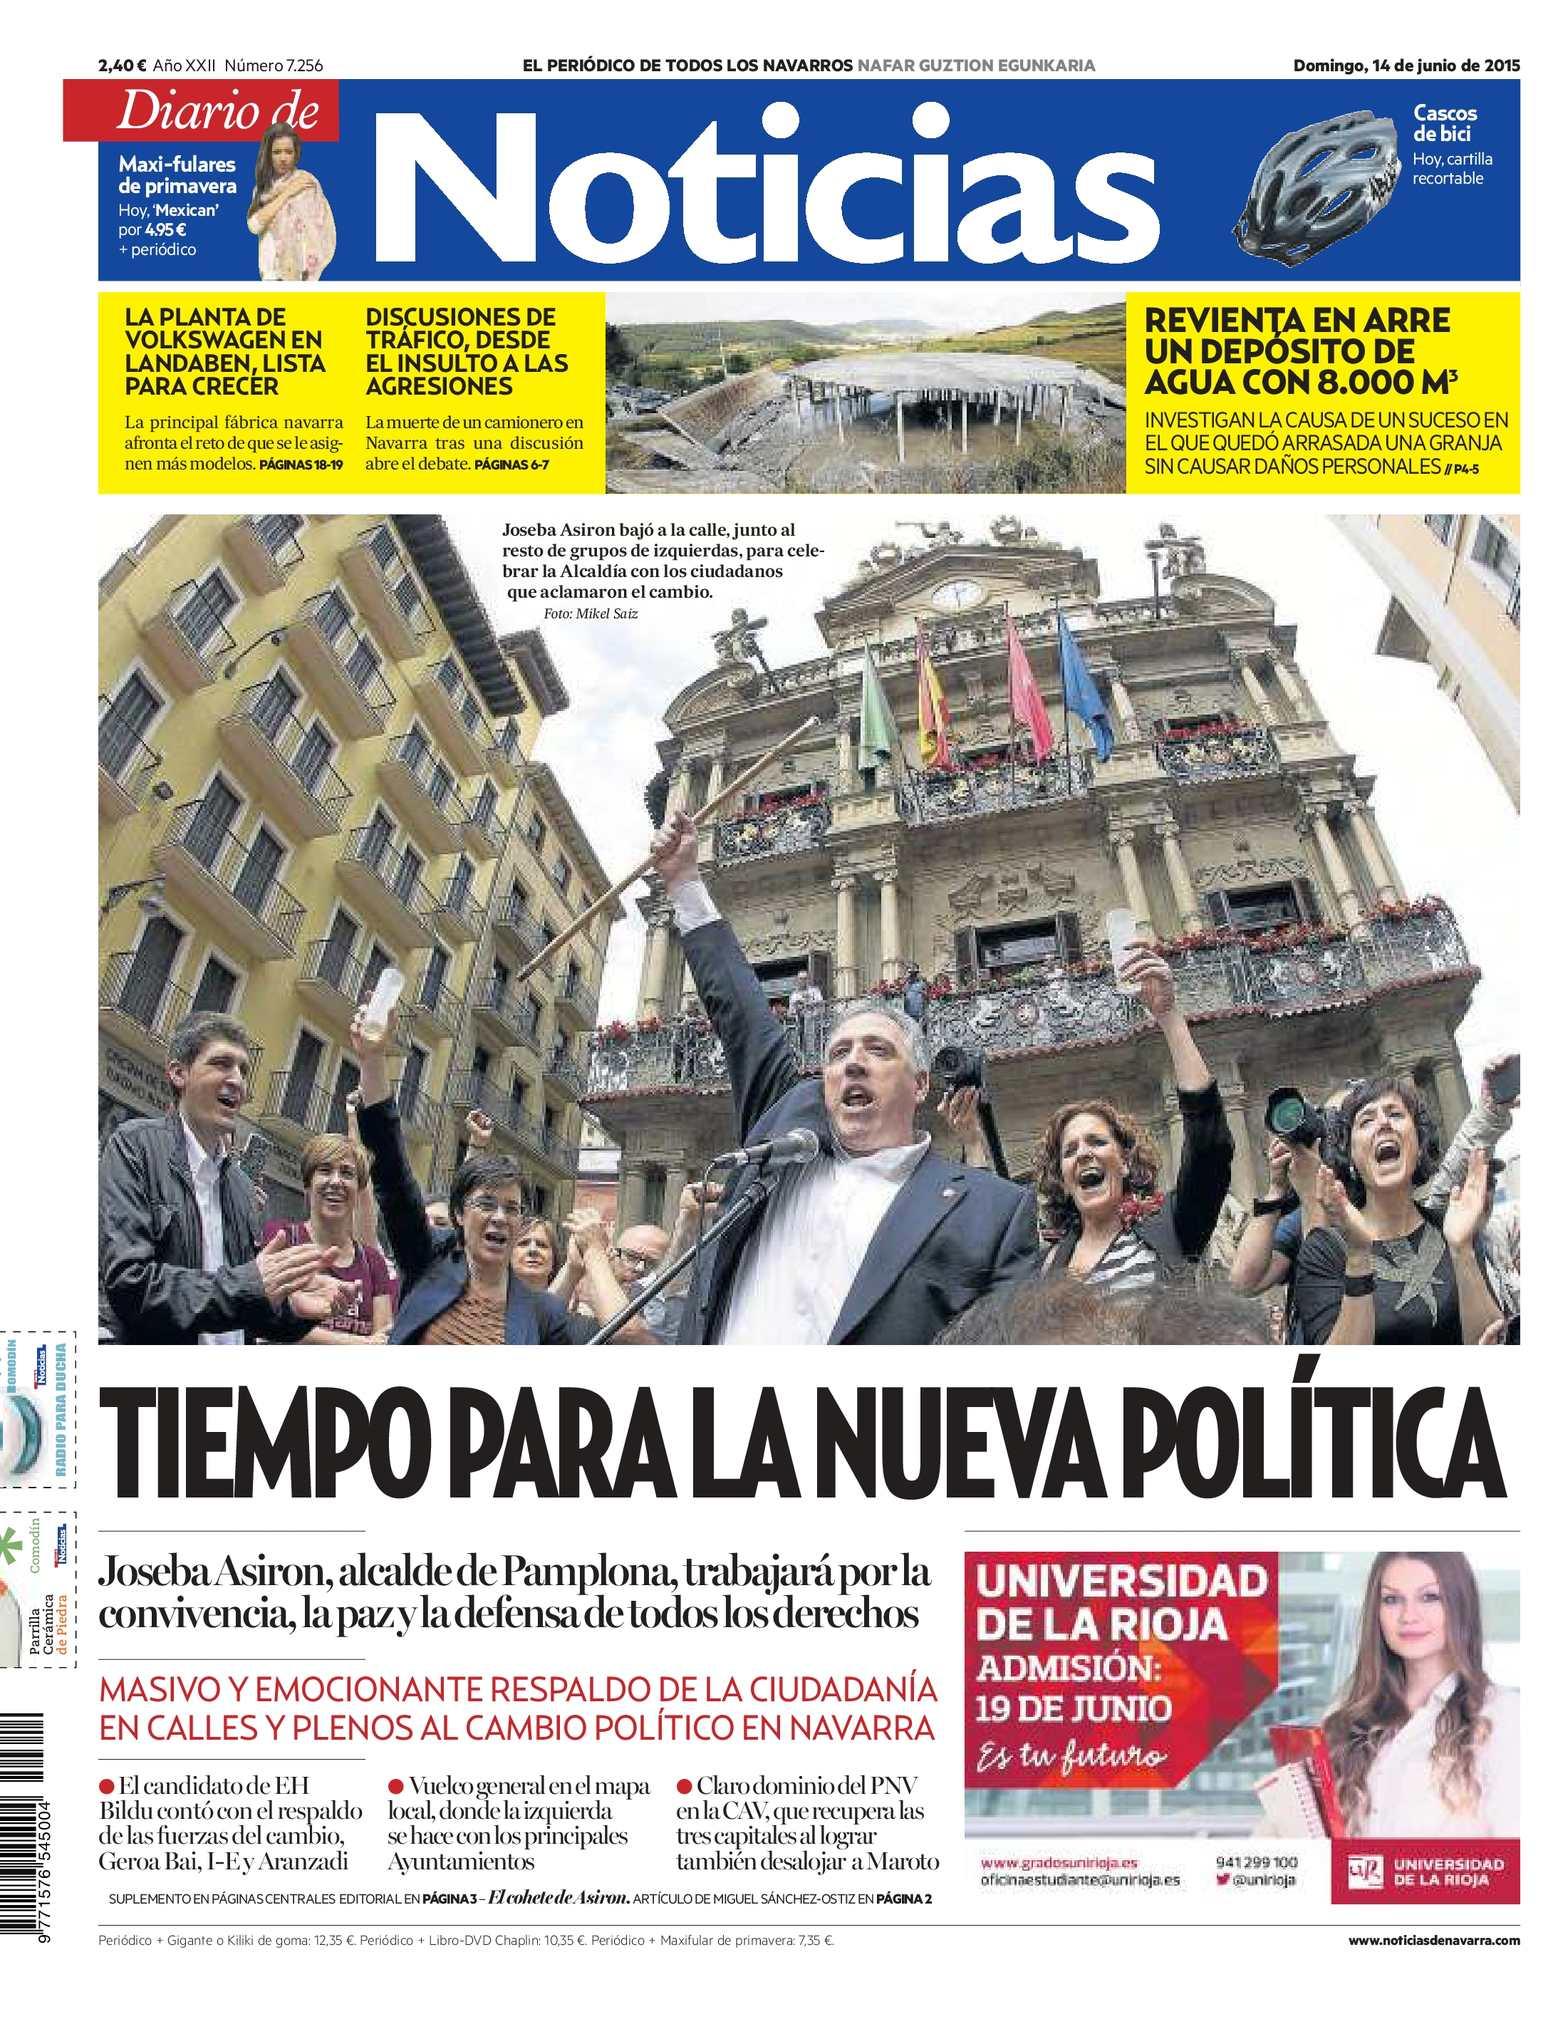 promo code 735c4 6ab17 Calaméo - Diario de Noticias 20150614